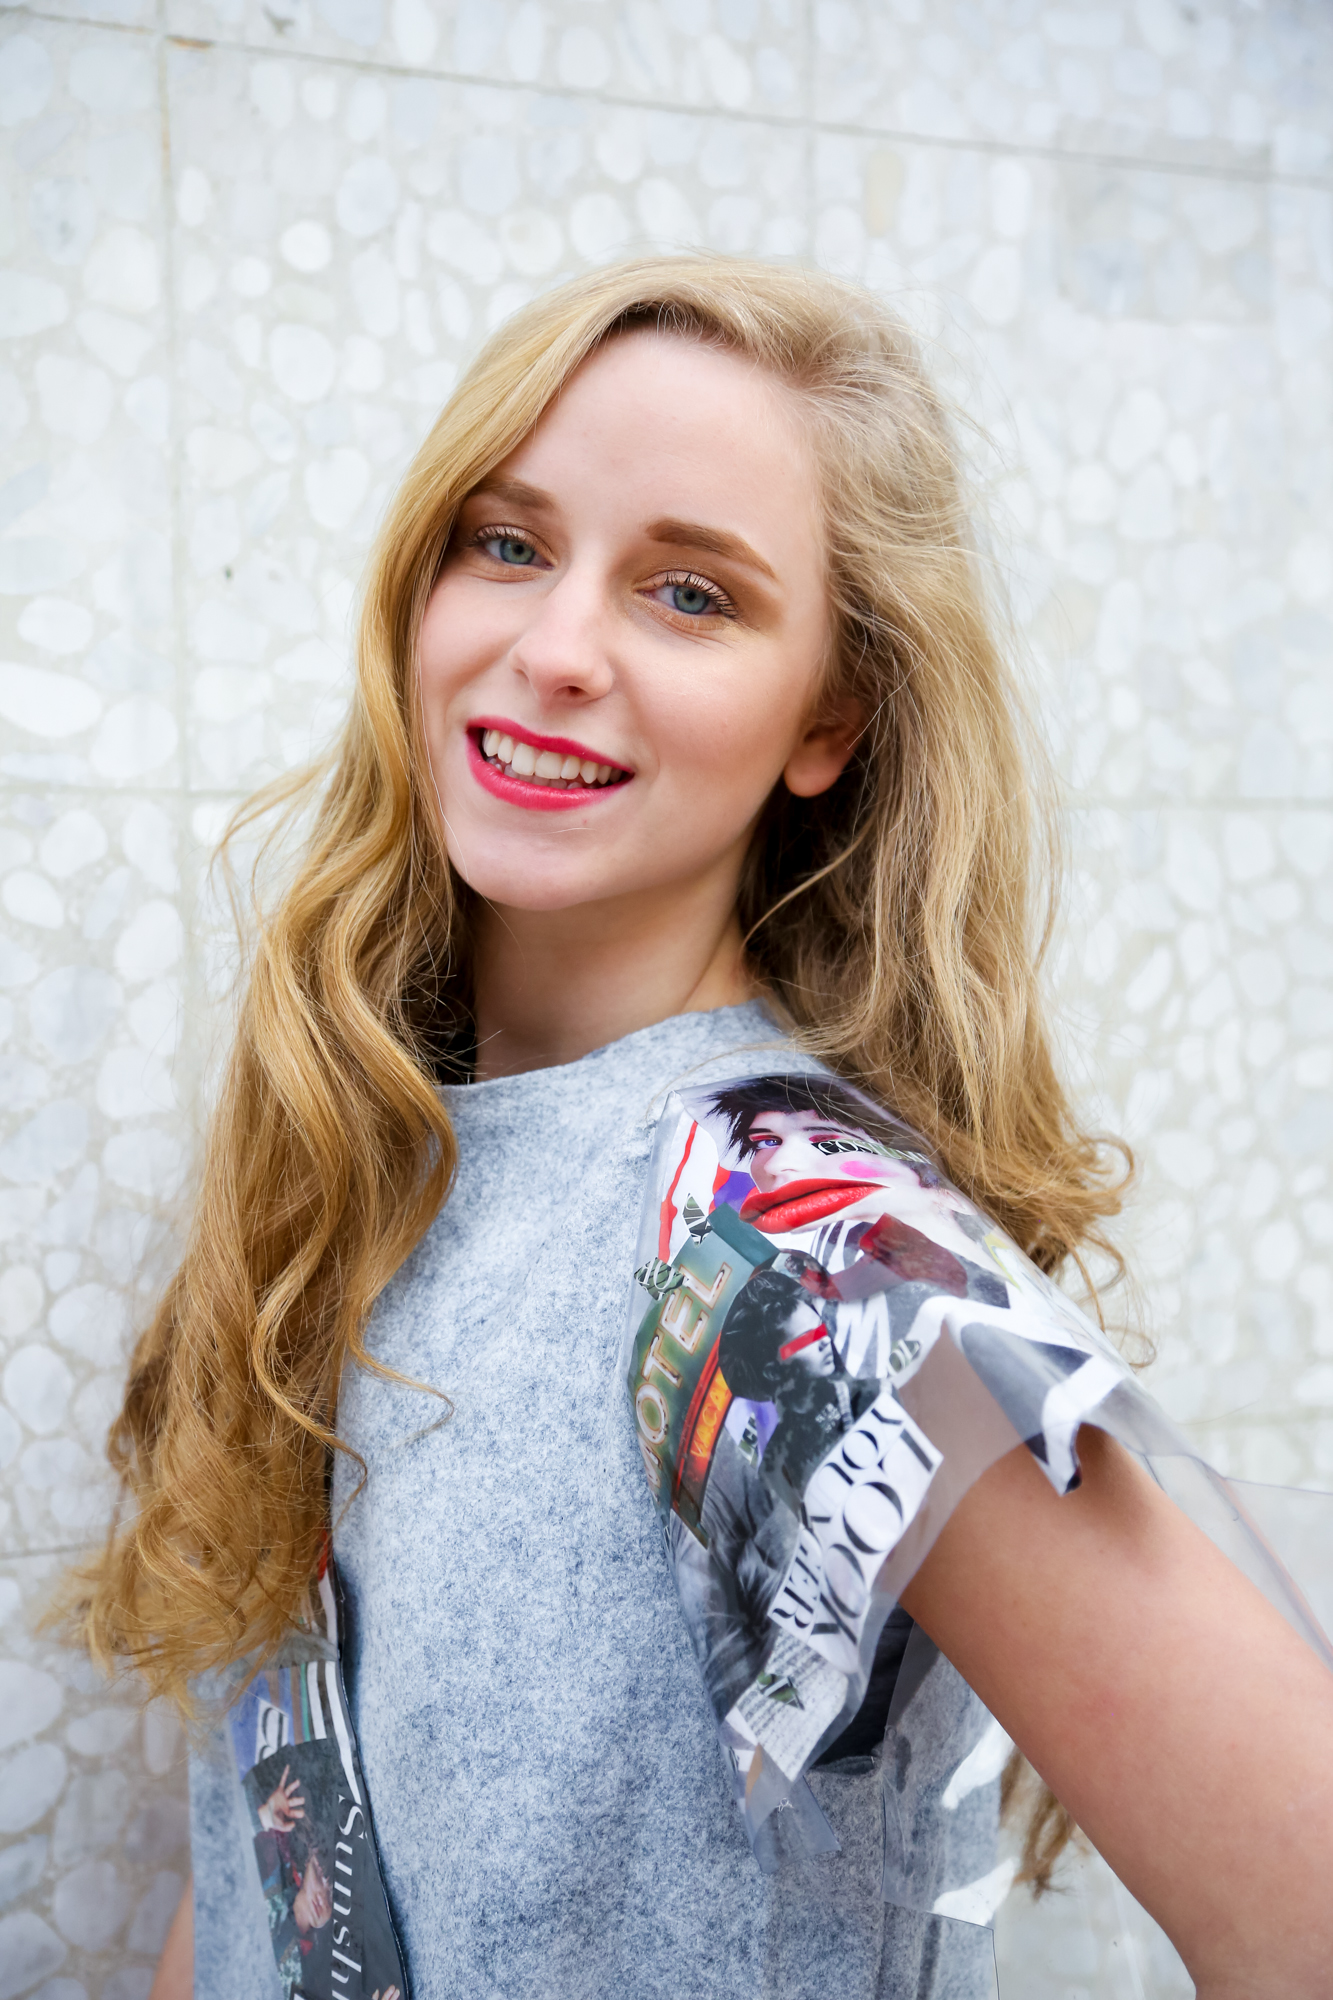 Fashion Photoshoot Hair and Makeup